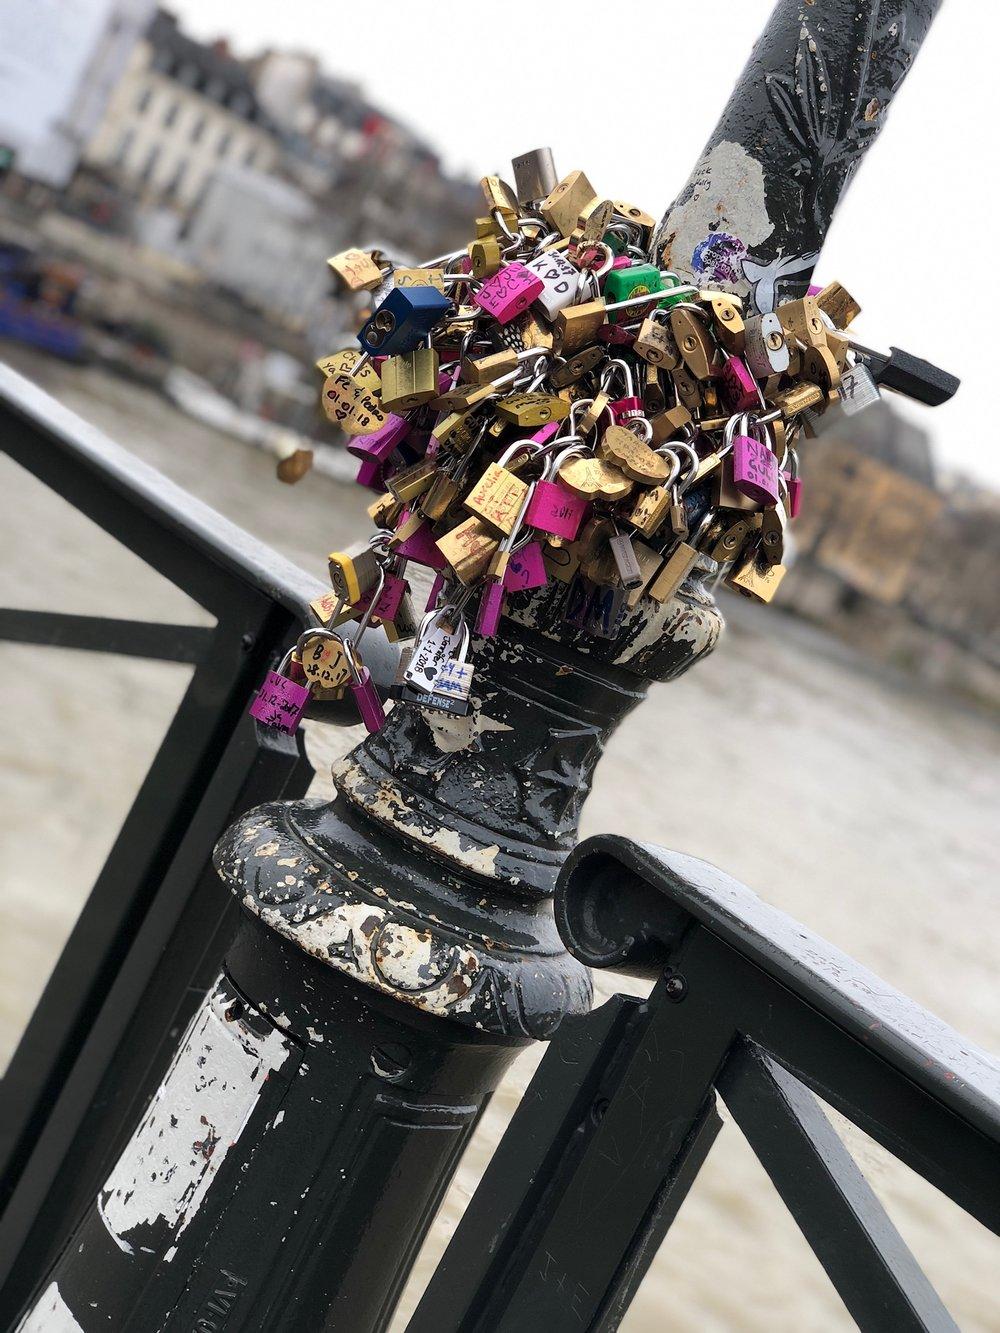 Remnants of the Lock Bridge in Paris